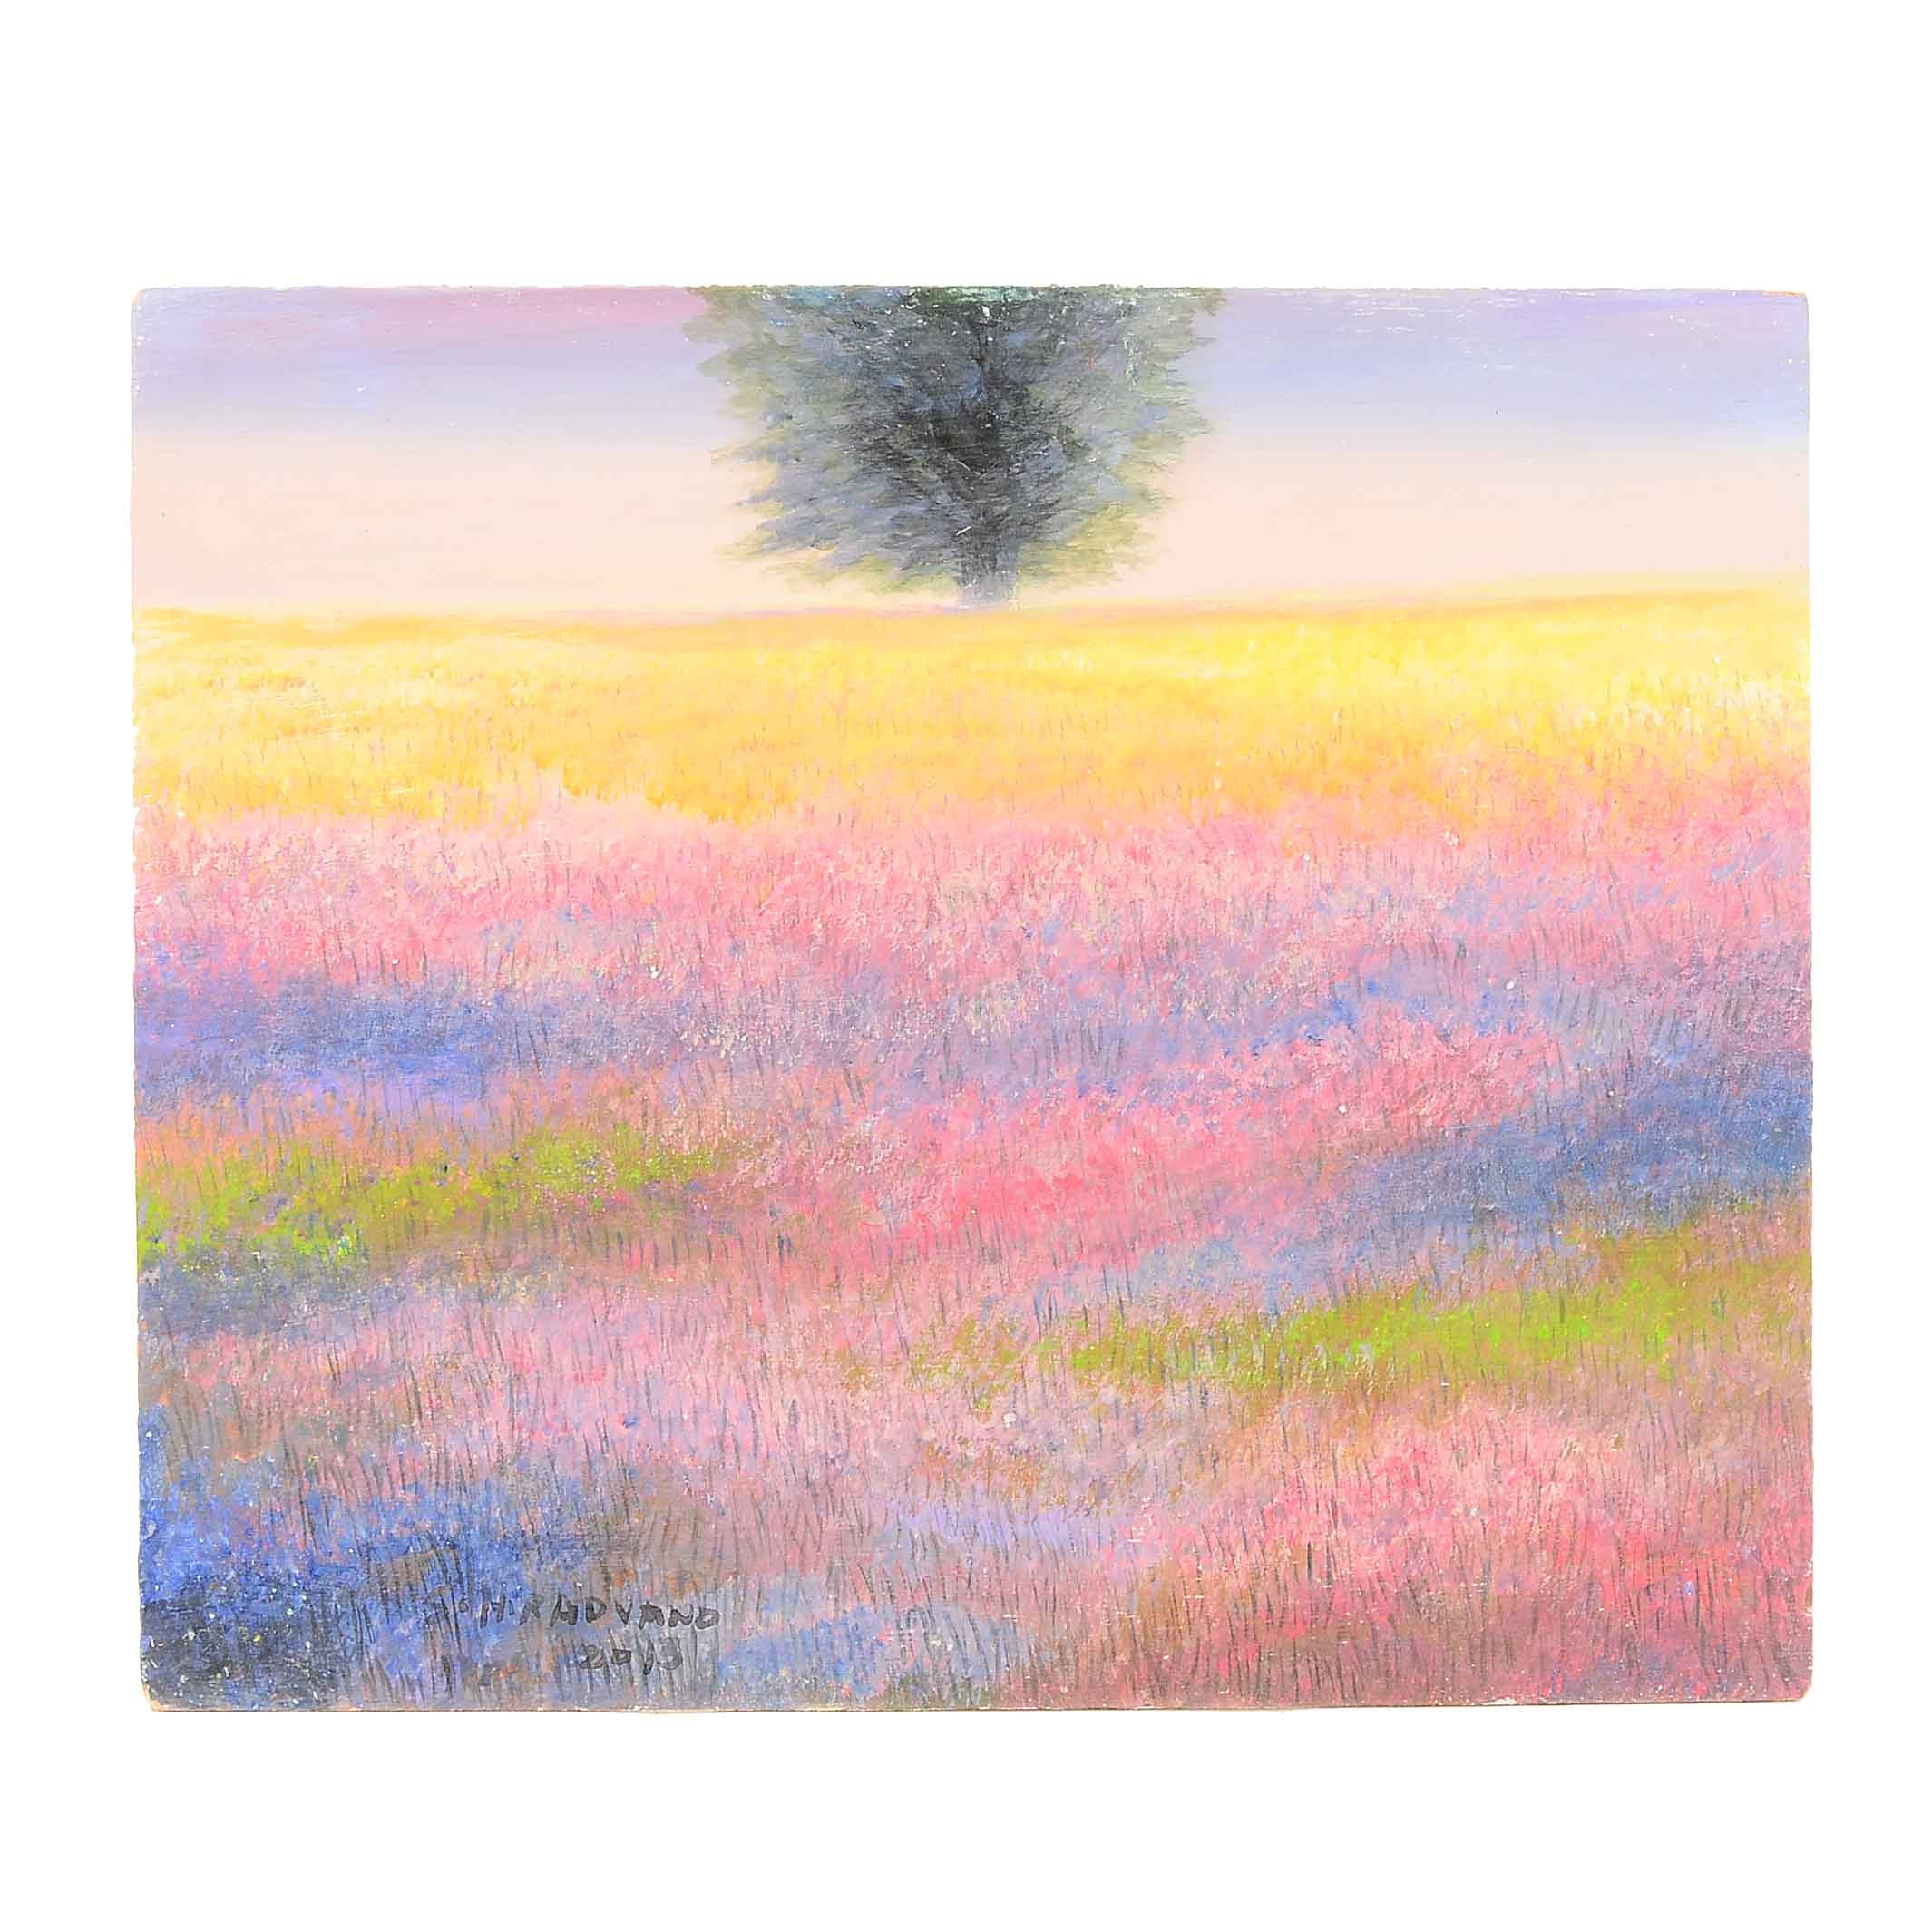 Sulmaz H. Radvand Impressionist Plein Air Landscape Painting on Board